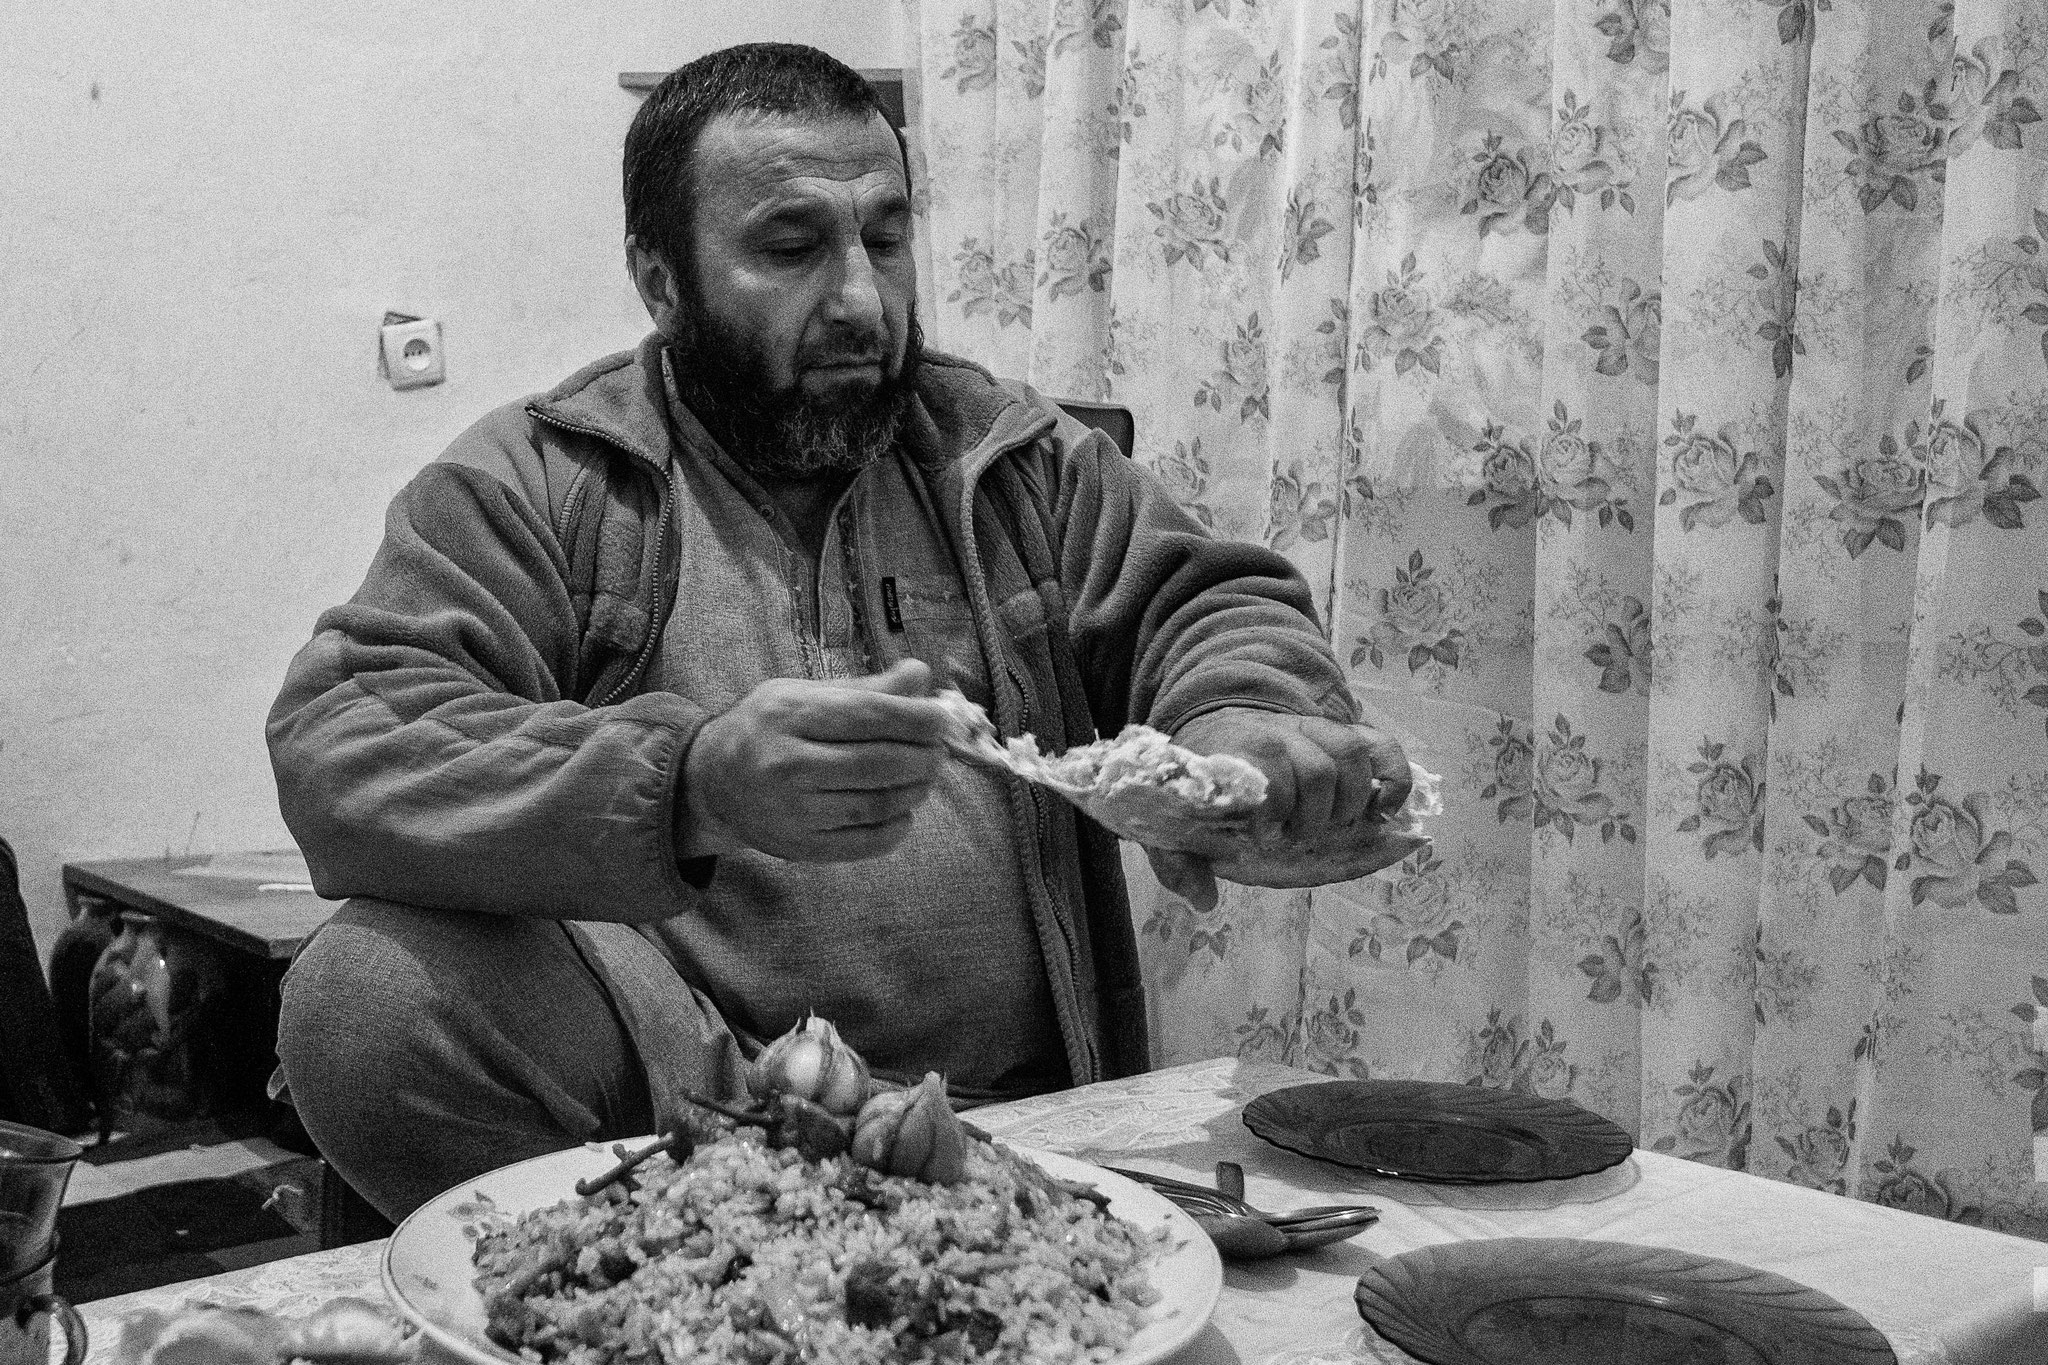 Commandar of Crimea Tartar Batallion, Crimea Tartar IDPs Collective house, near Vinitza, 2016